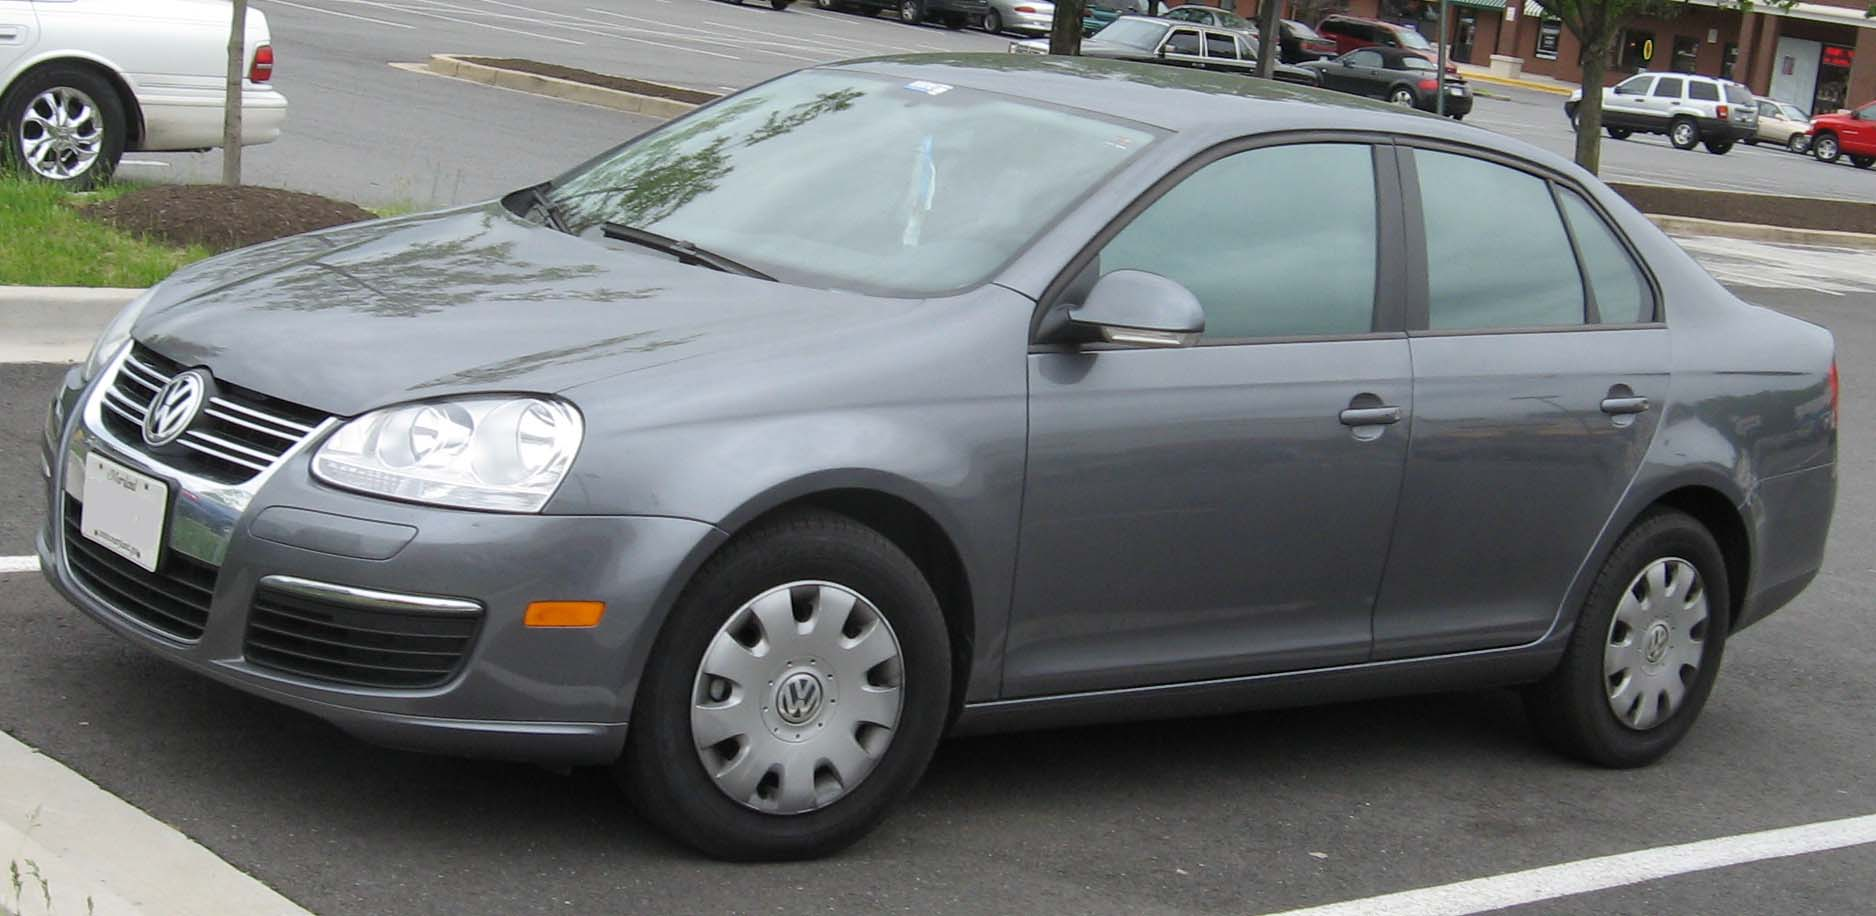 File:06-07 Volkswagen Jetta Value Edition.jpg - Wikimedia Commons